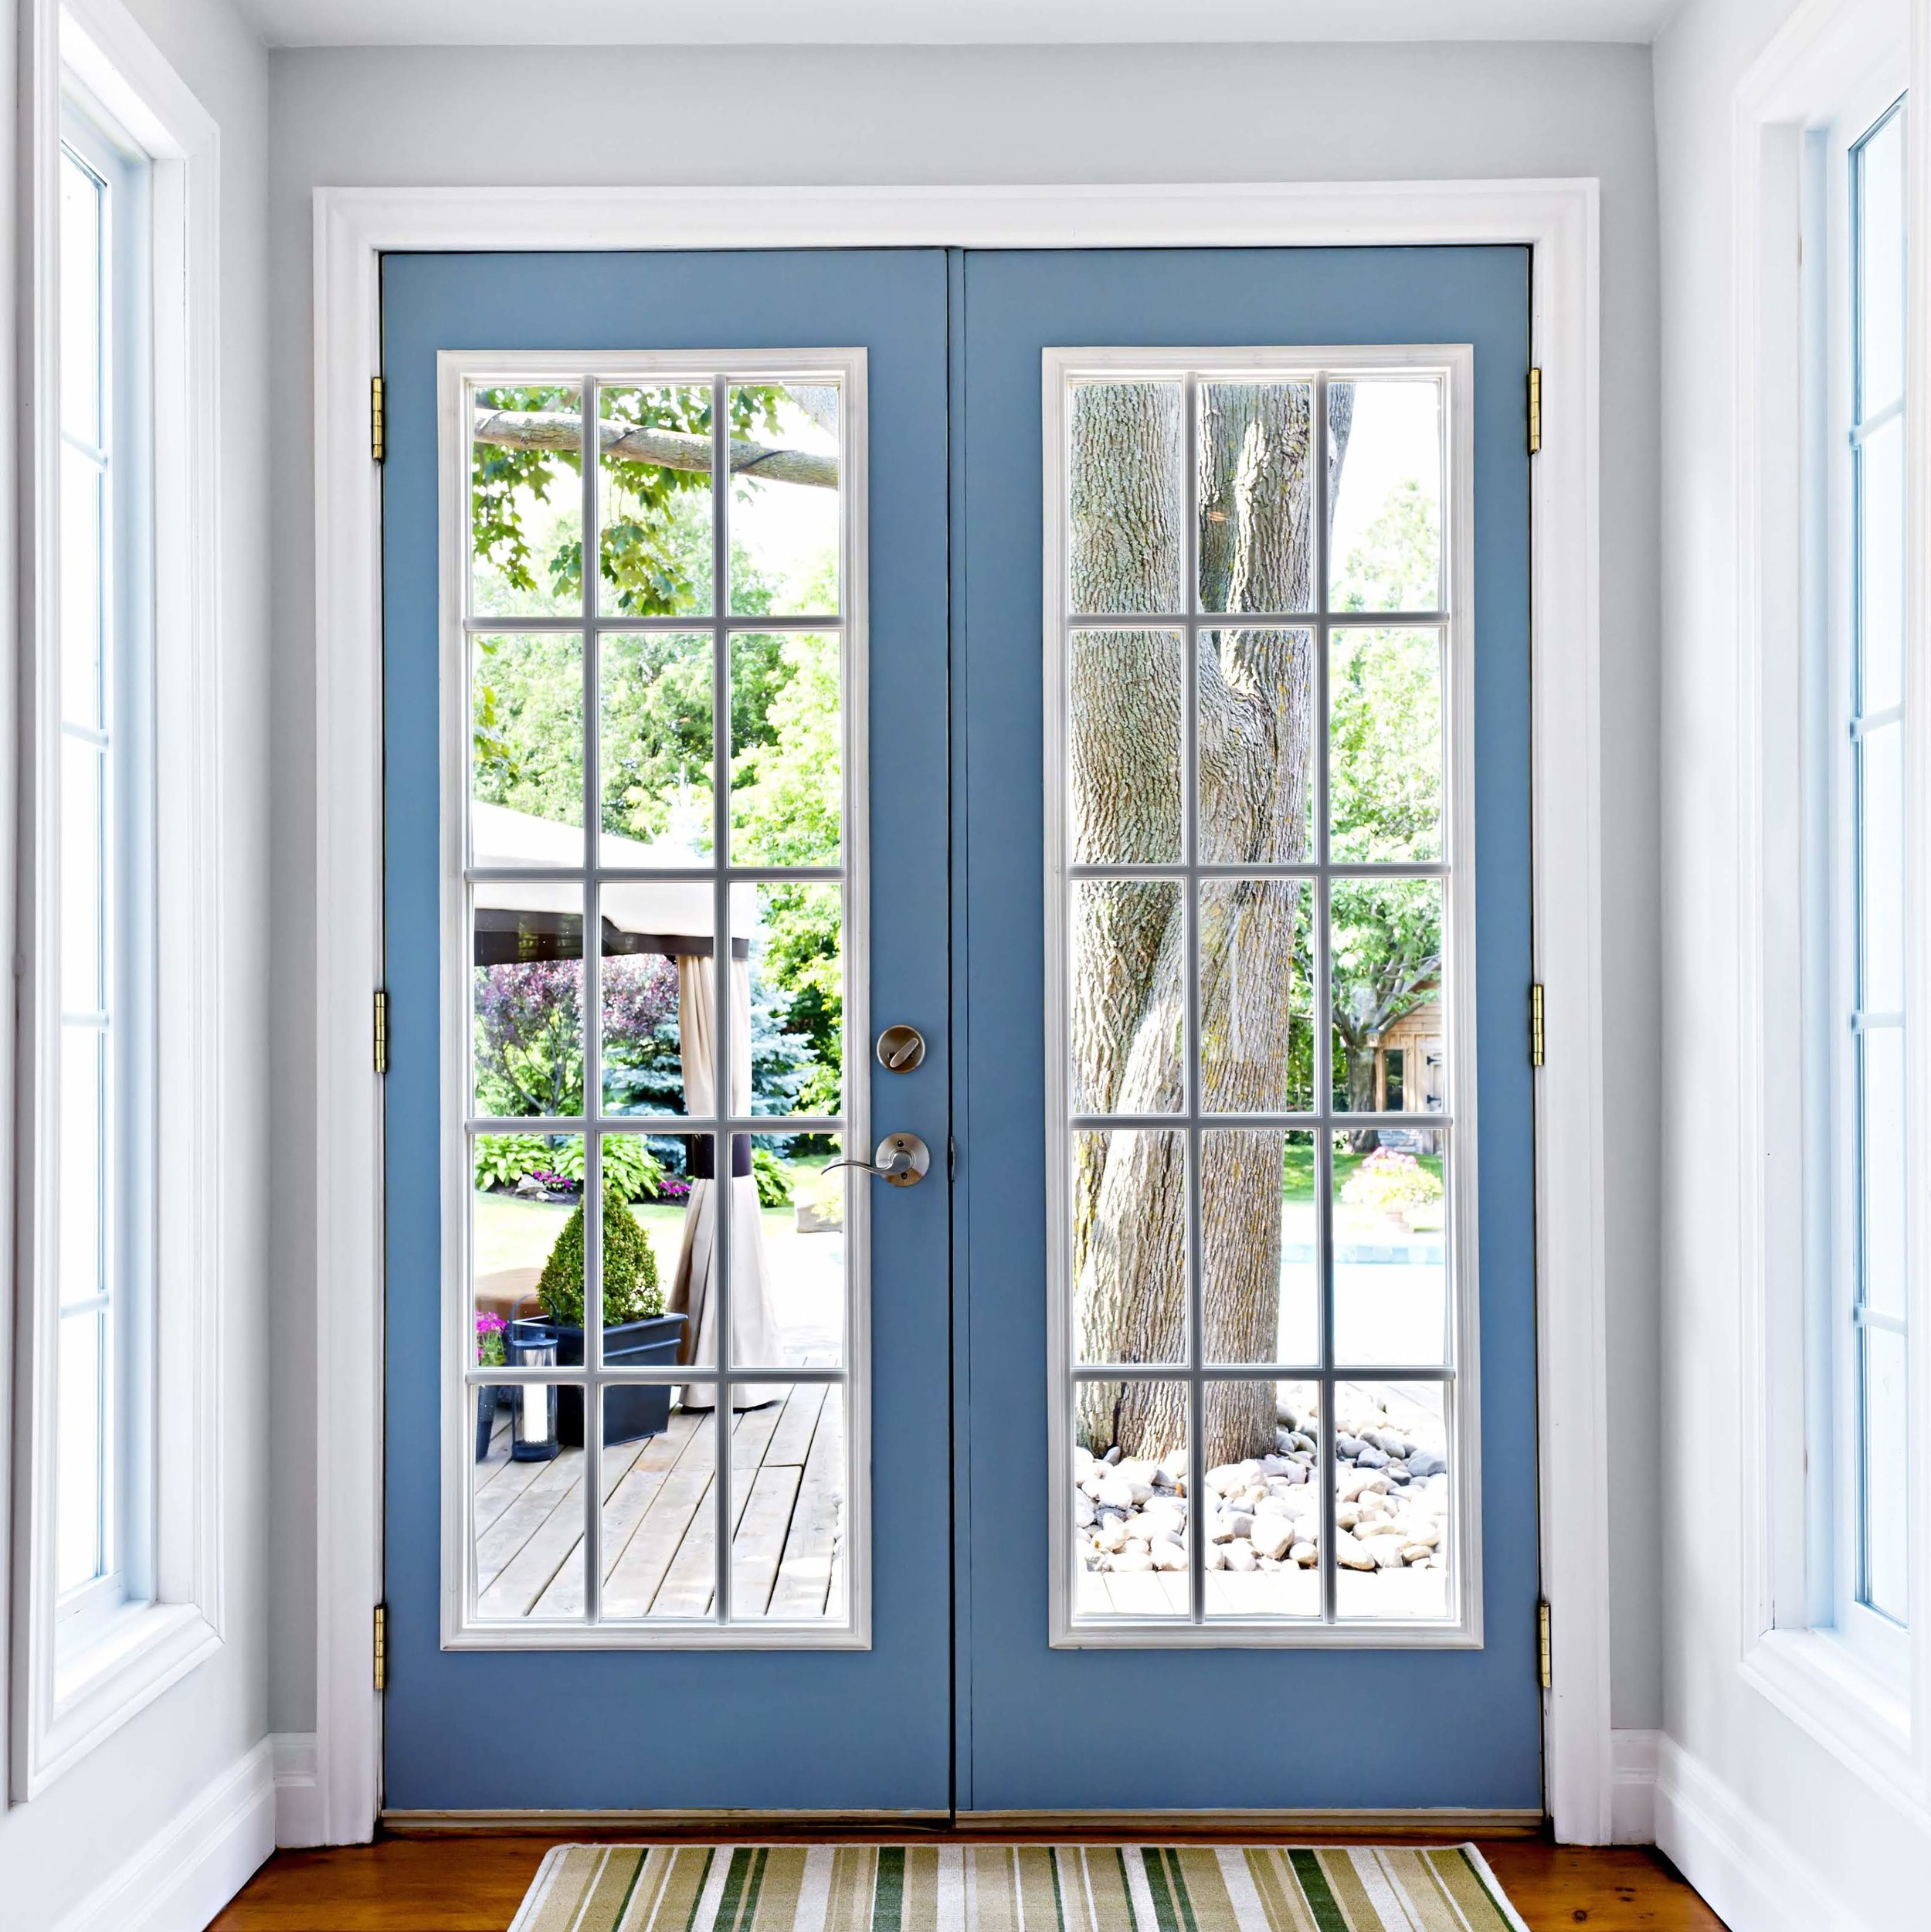 Jamb - The vertical side of a window or door frame